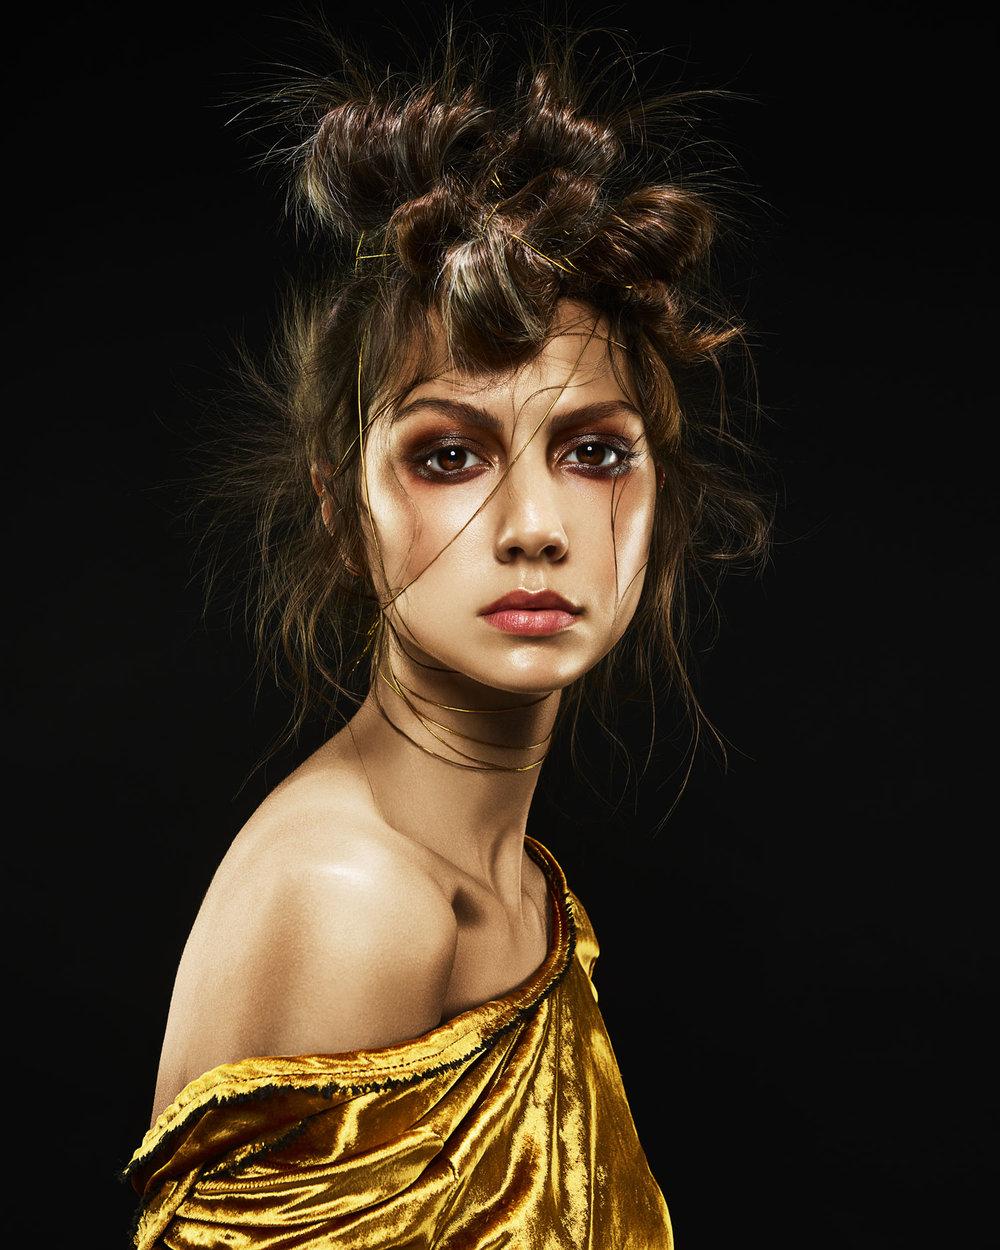 sarah-cochran-wardrobe-stylist-minneapolis-st-paul-creative-stylist-5.jpg